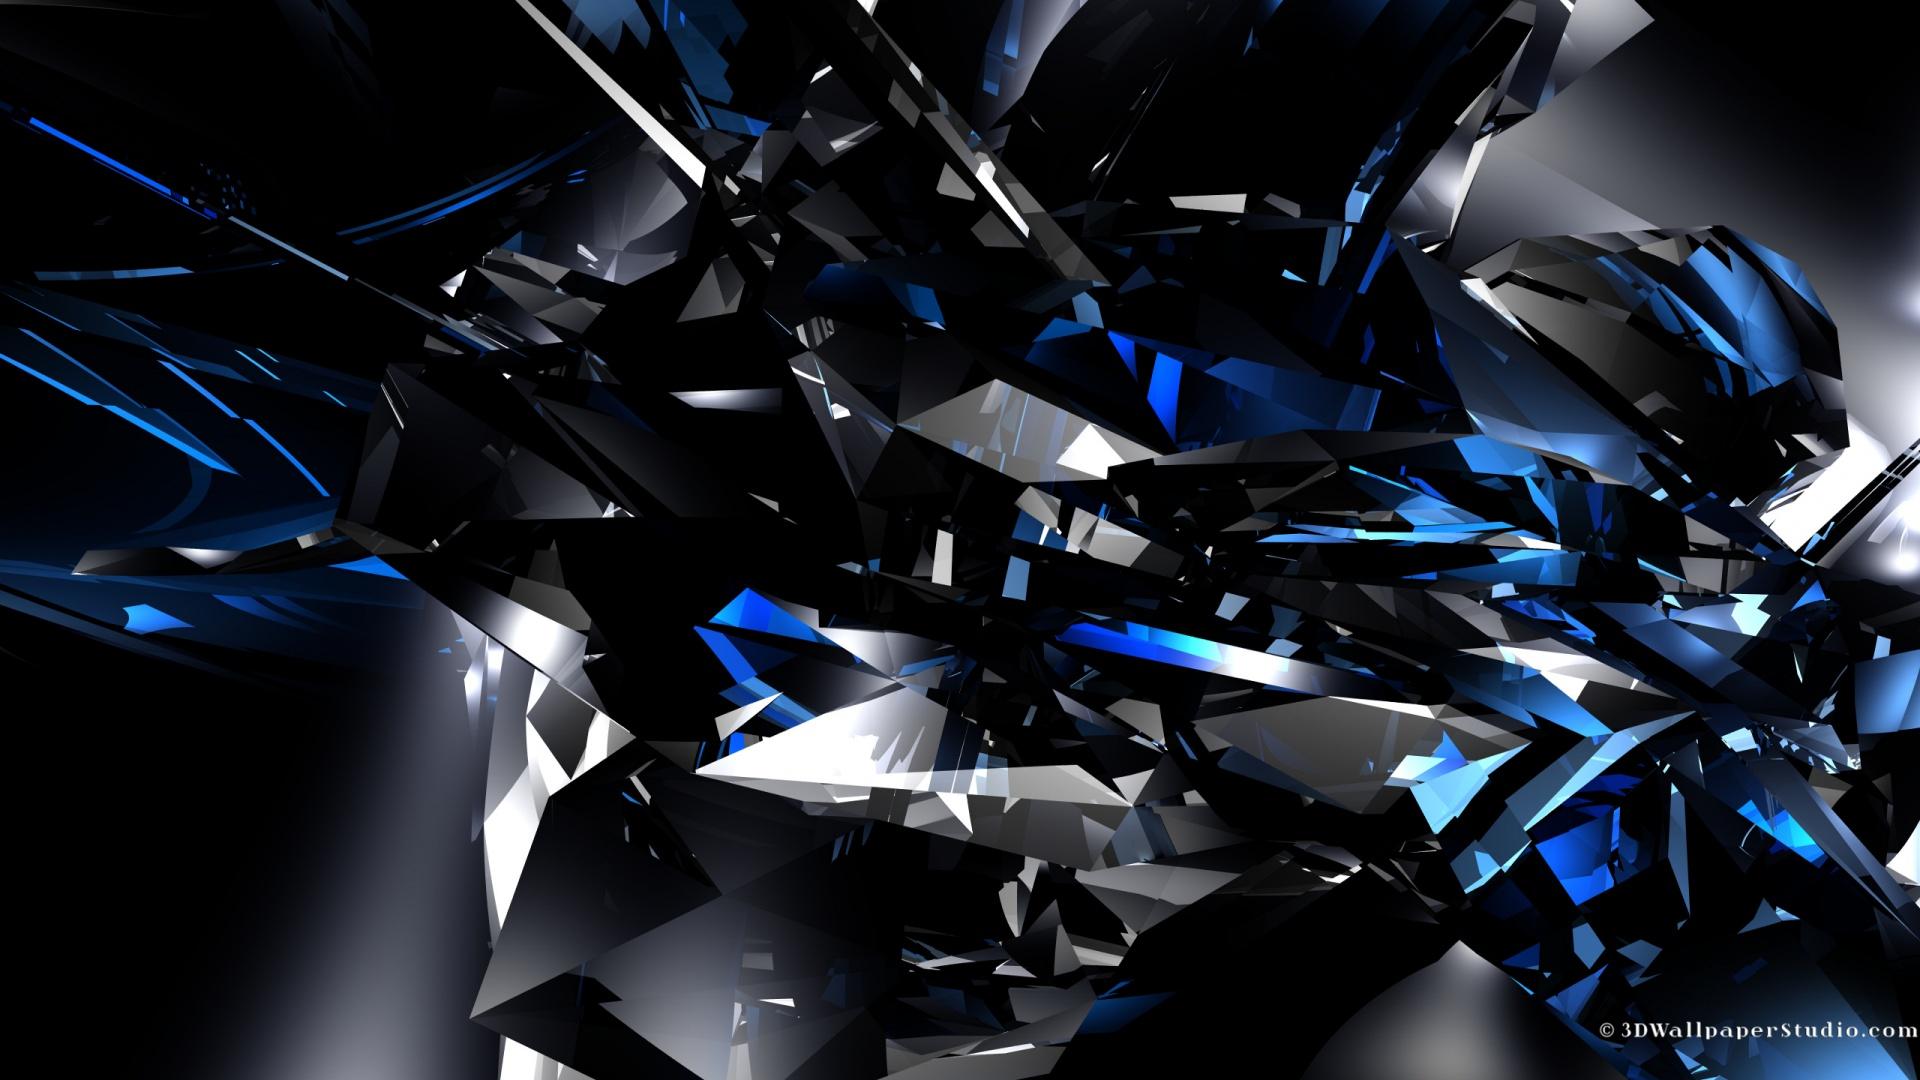 3D blue crystals wallpaper in 1920x1080 screen resolution 1920x1080